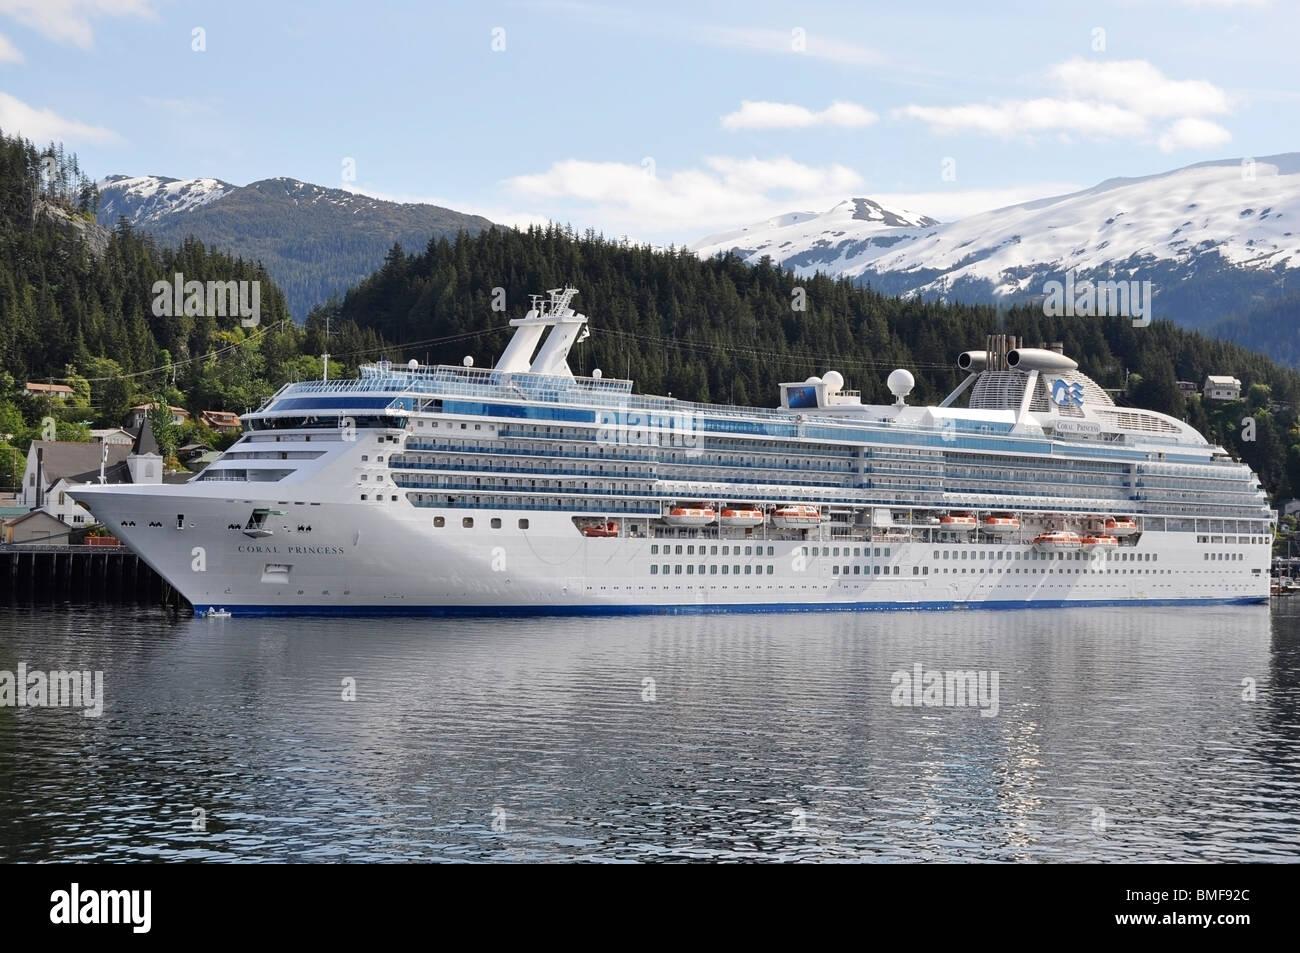 Cruise Ship - Coral Princess, Alaska. - Stock Image